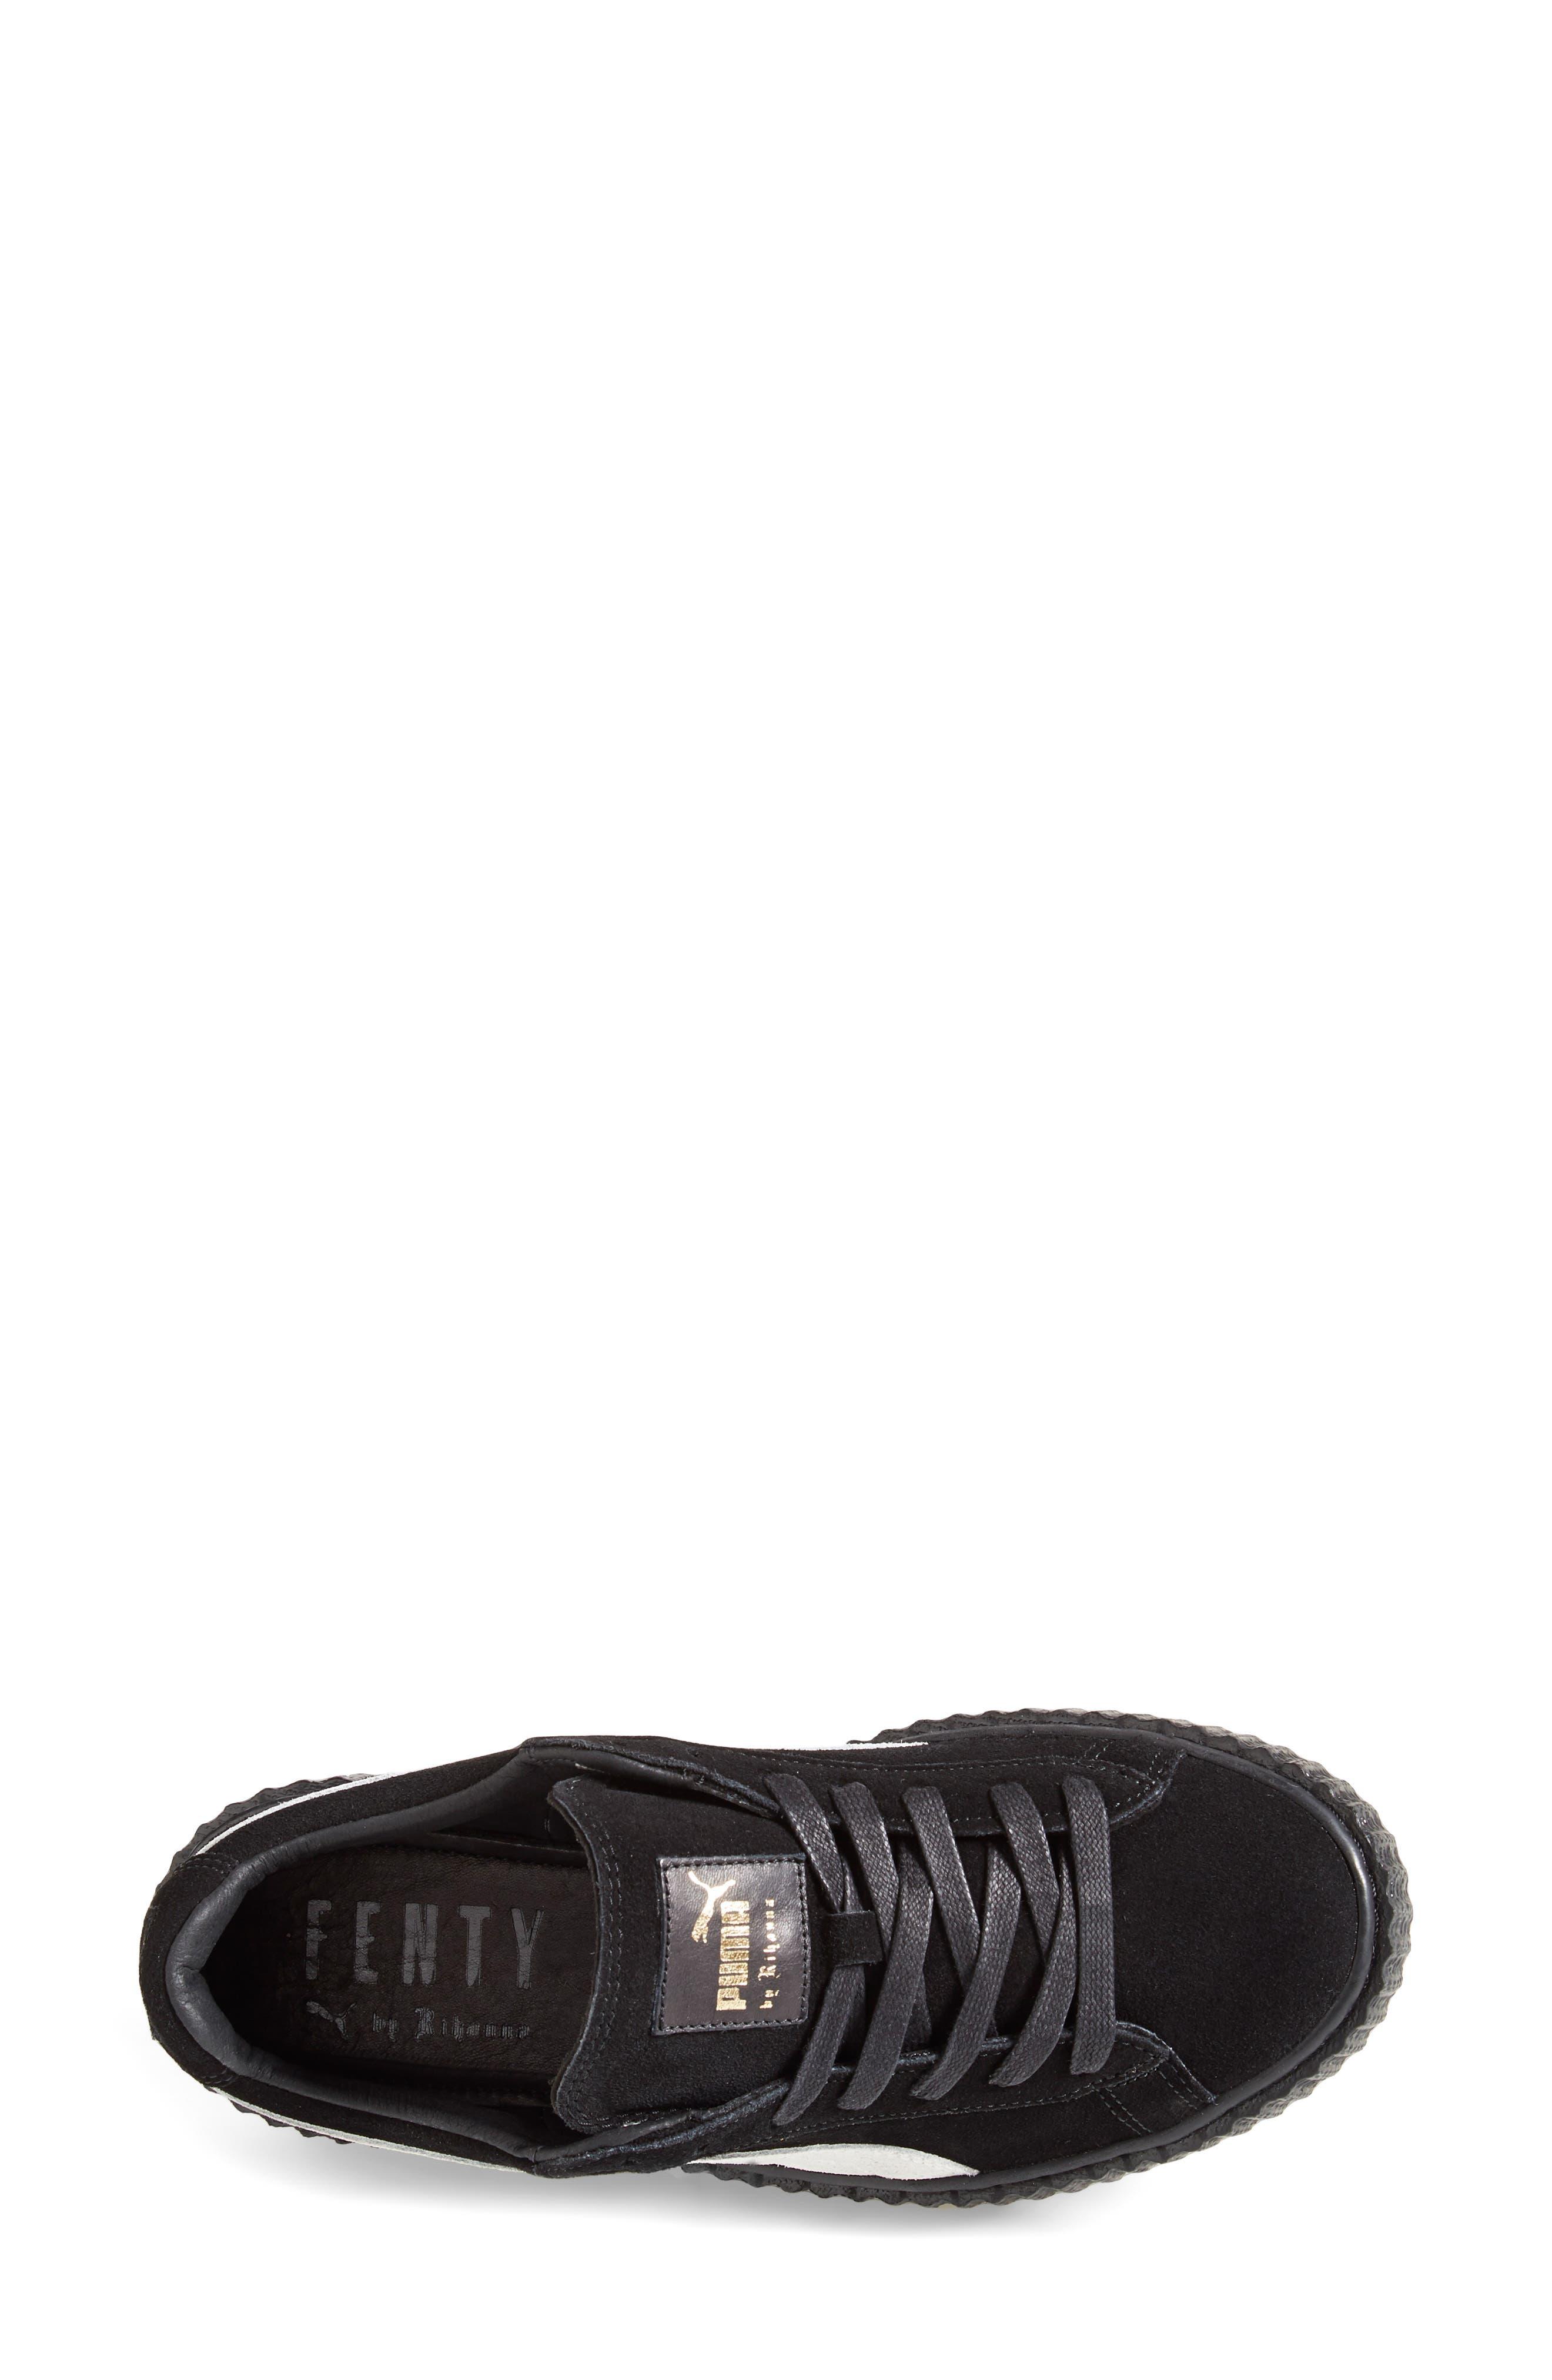 FENTY PUMA by Rihanna Creeper Sneaker,                             Alternate thumbnail 46, color,